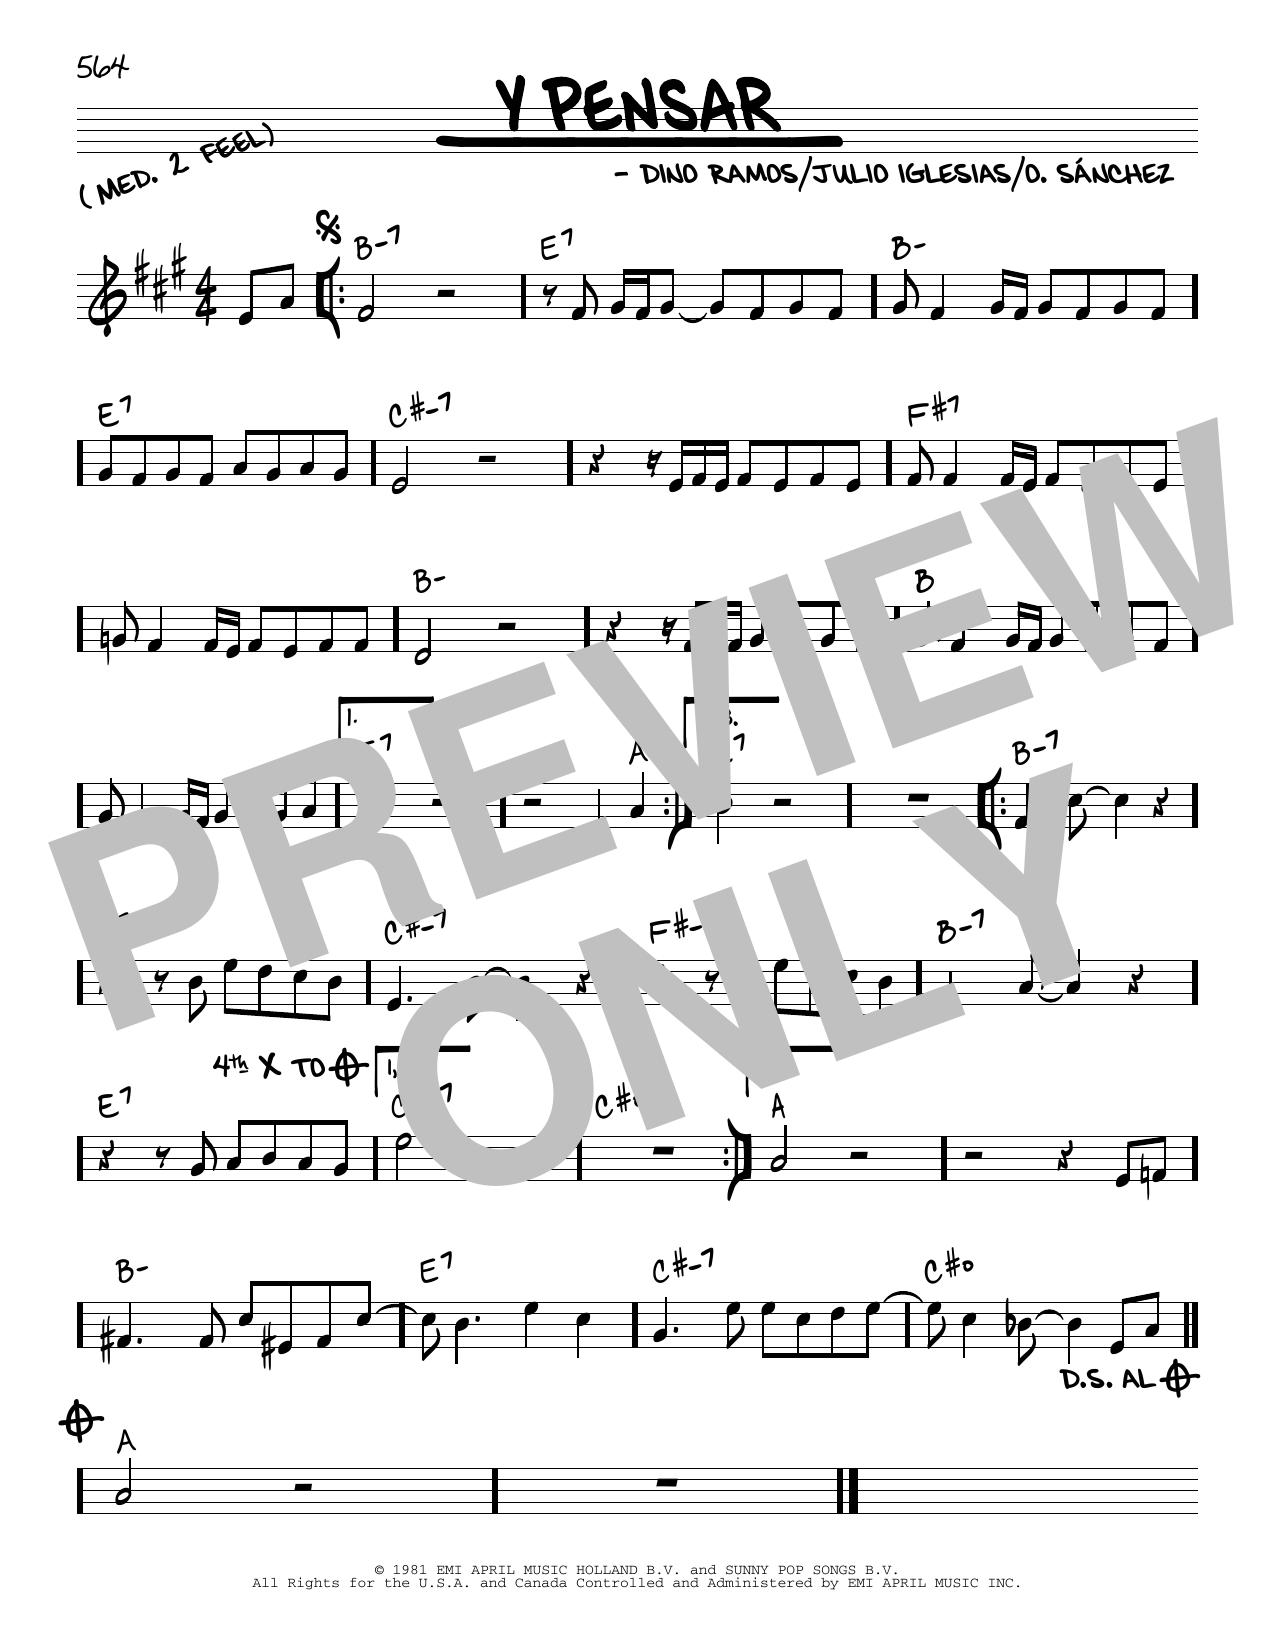 Julio Iglesias Y Pensar sheet music notes and chords. Download Printable PDF.